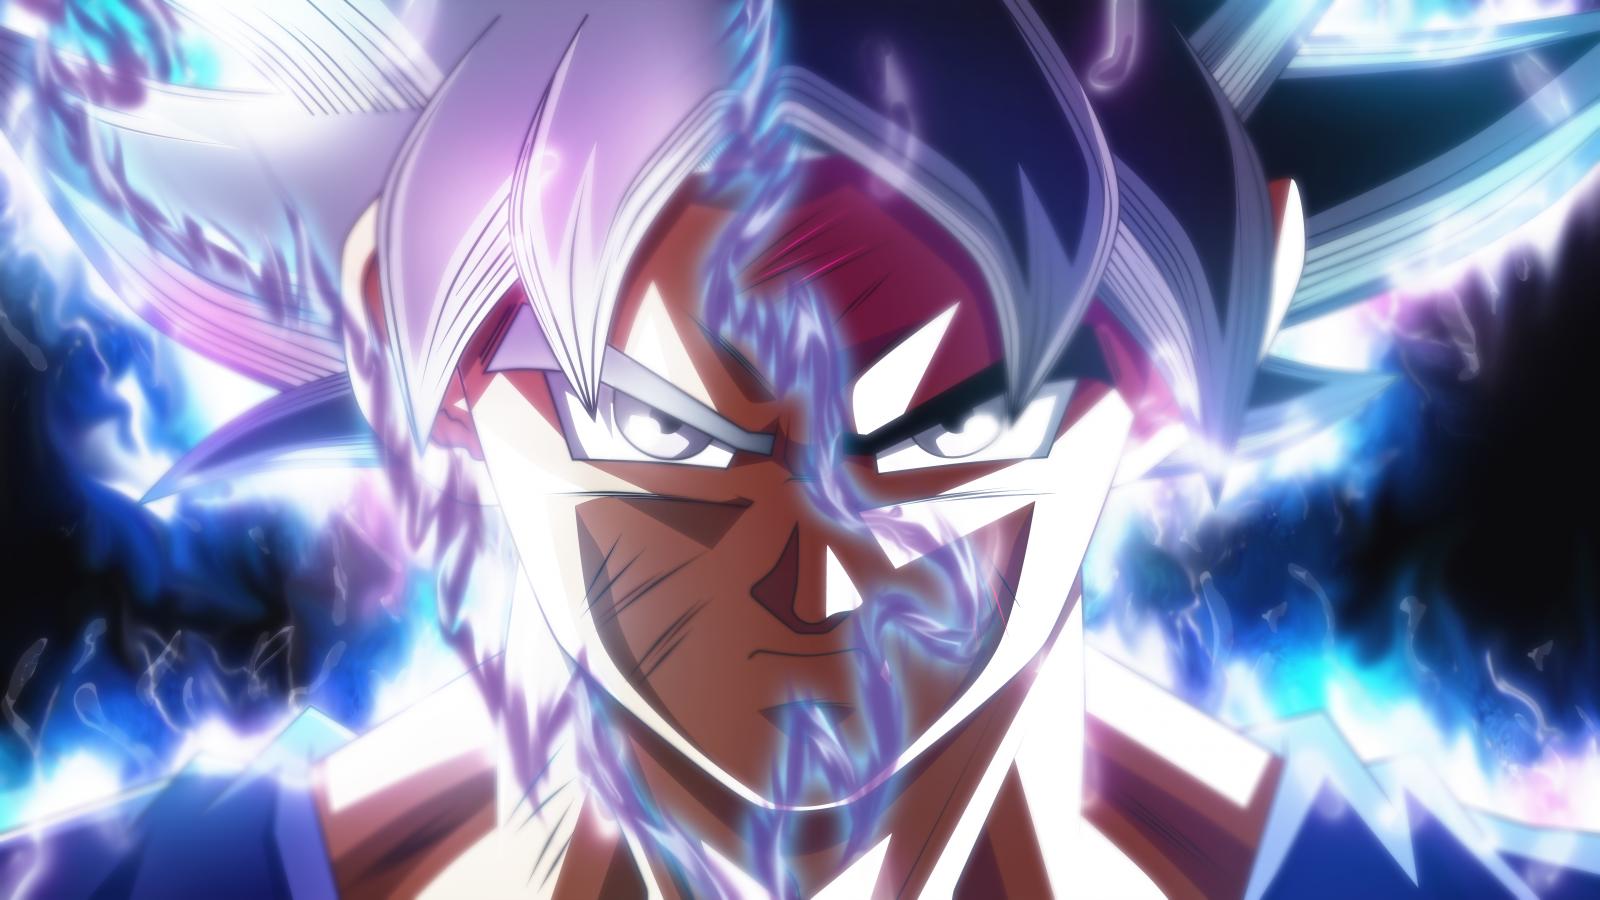 Fond d'écran : Dragon Ball Super, Mastered ultra instinct, Ultra Instinct, Son Goku, rmehedi ...